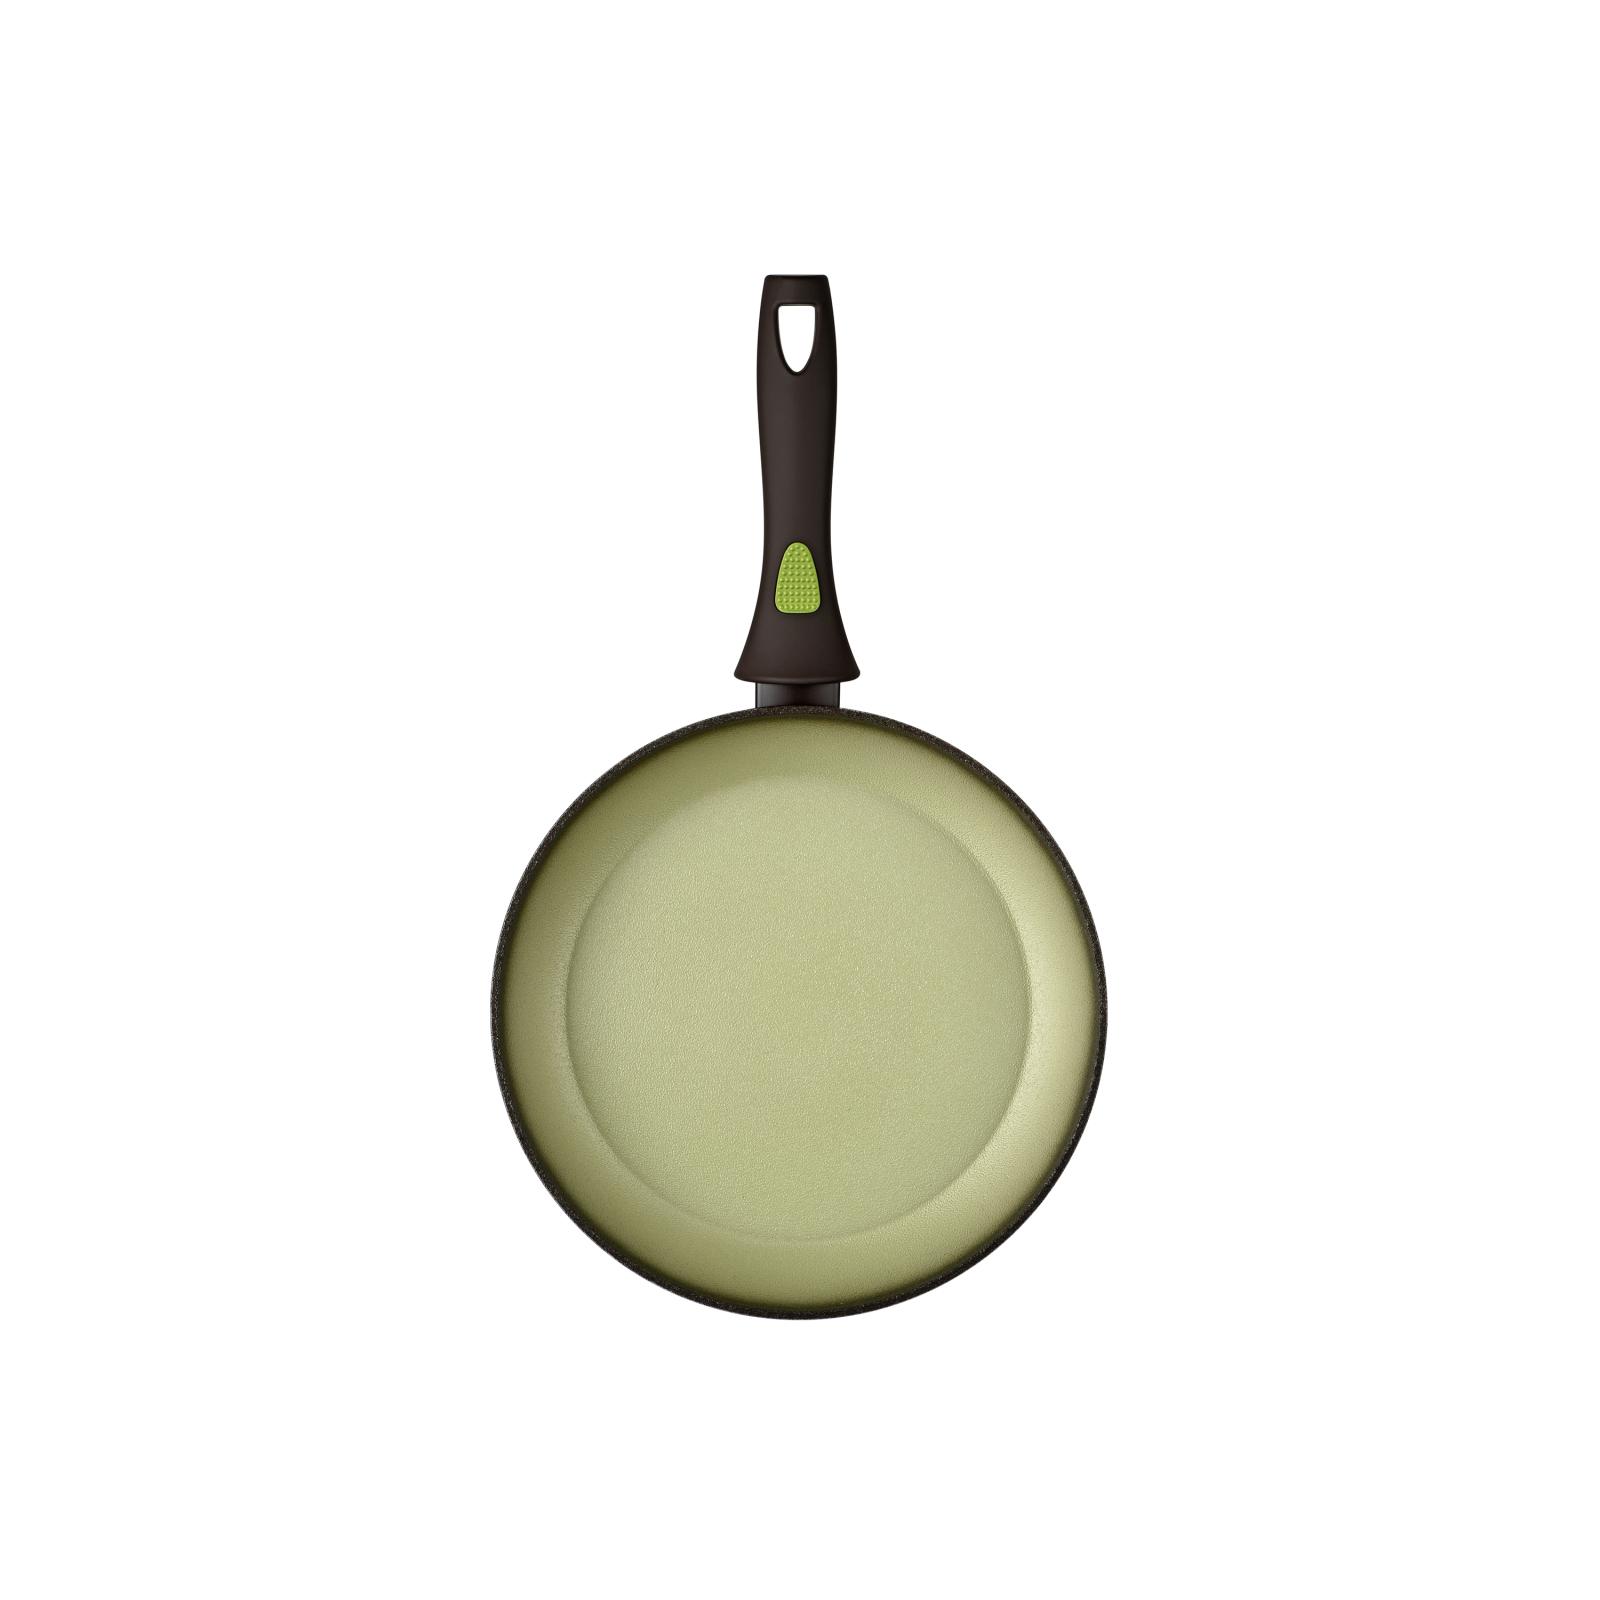 Сковорода Ardesto Avocado 26 см (AR2526FA) зображення 2